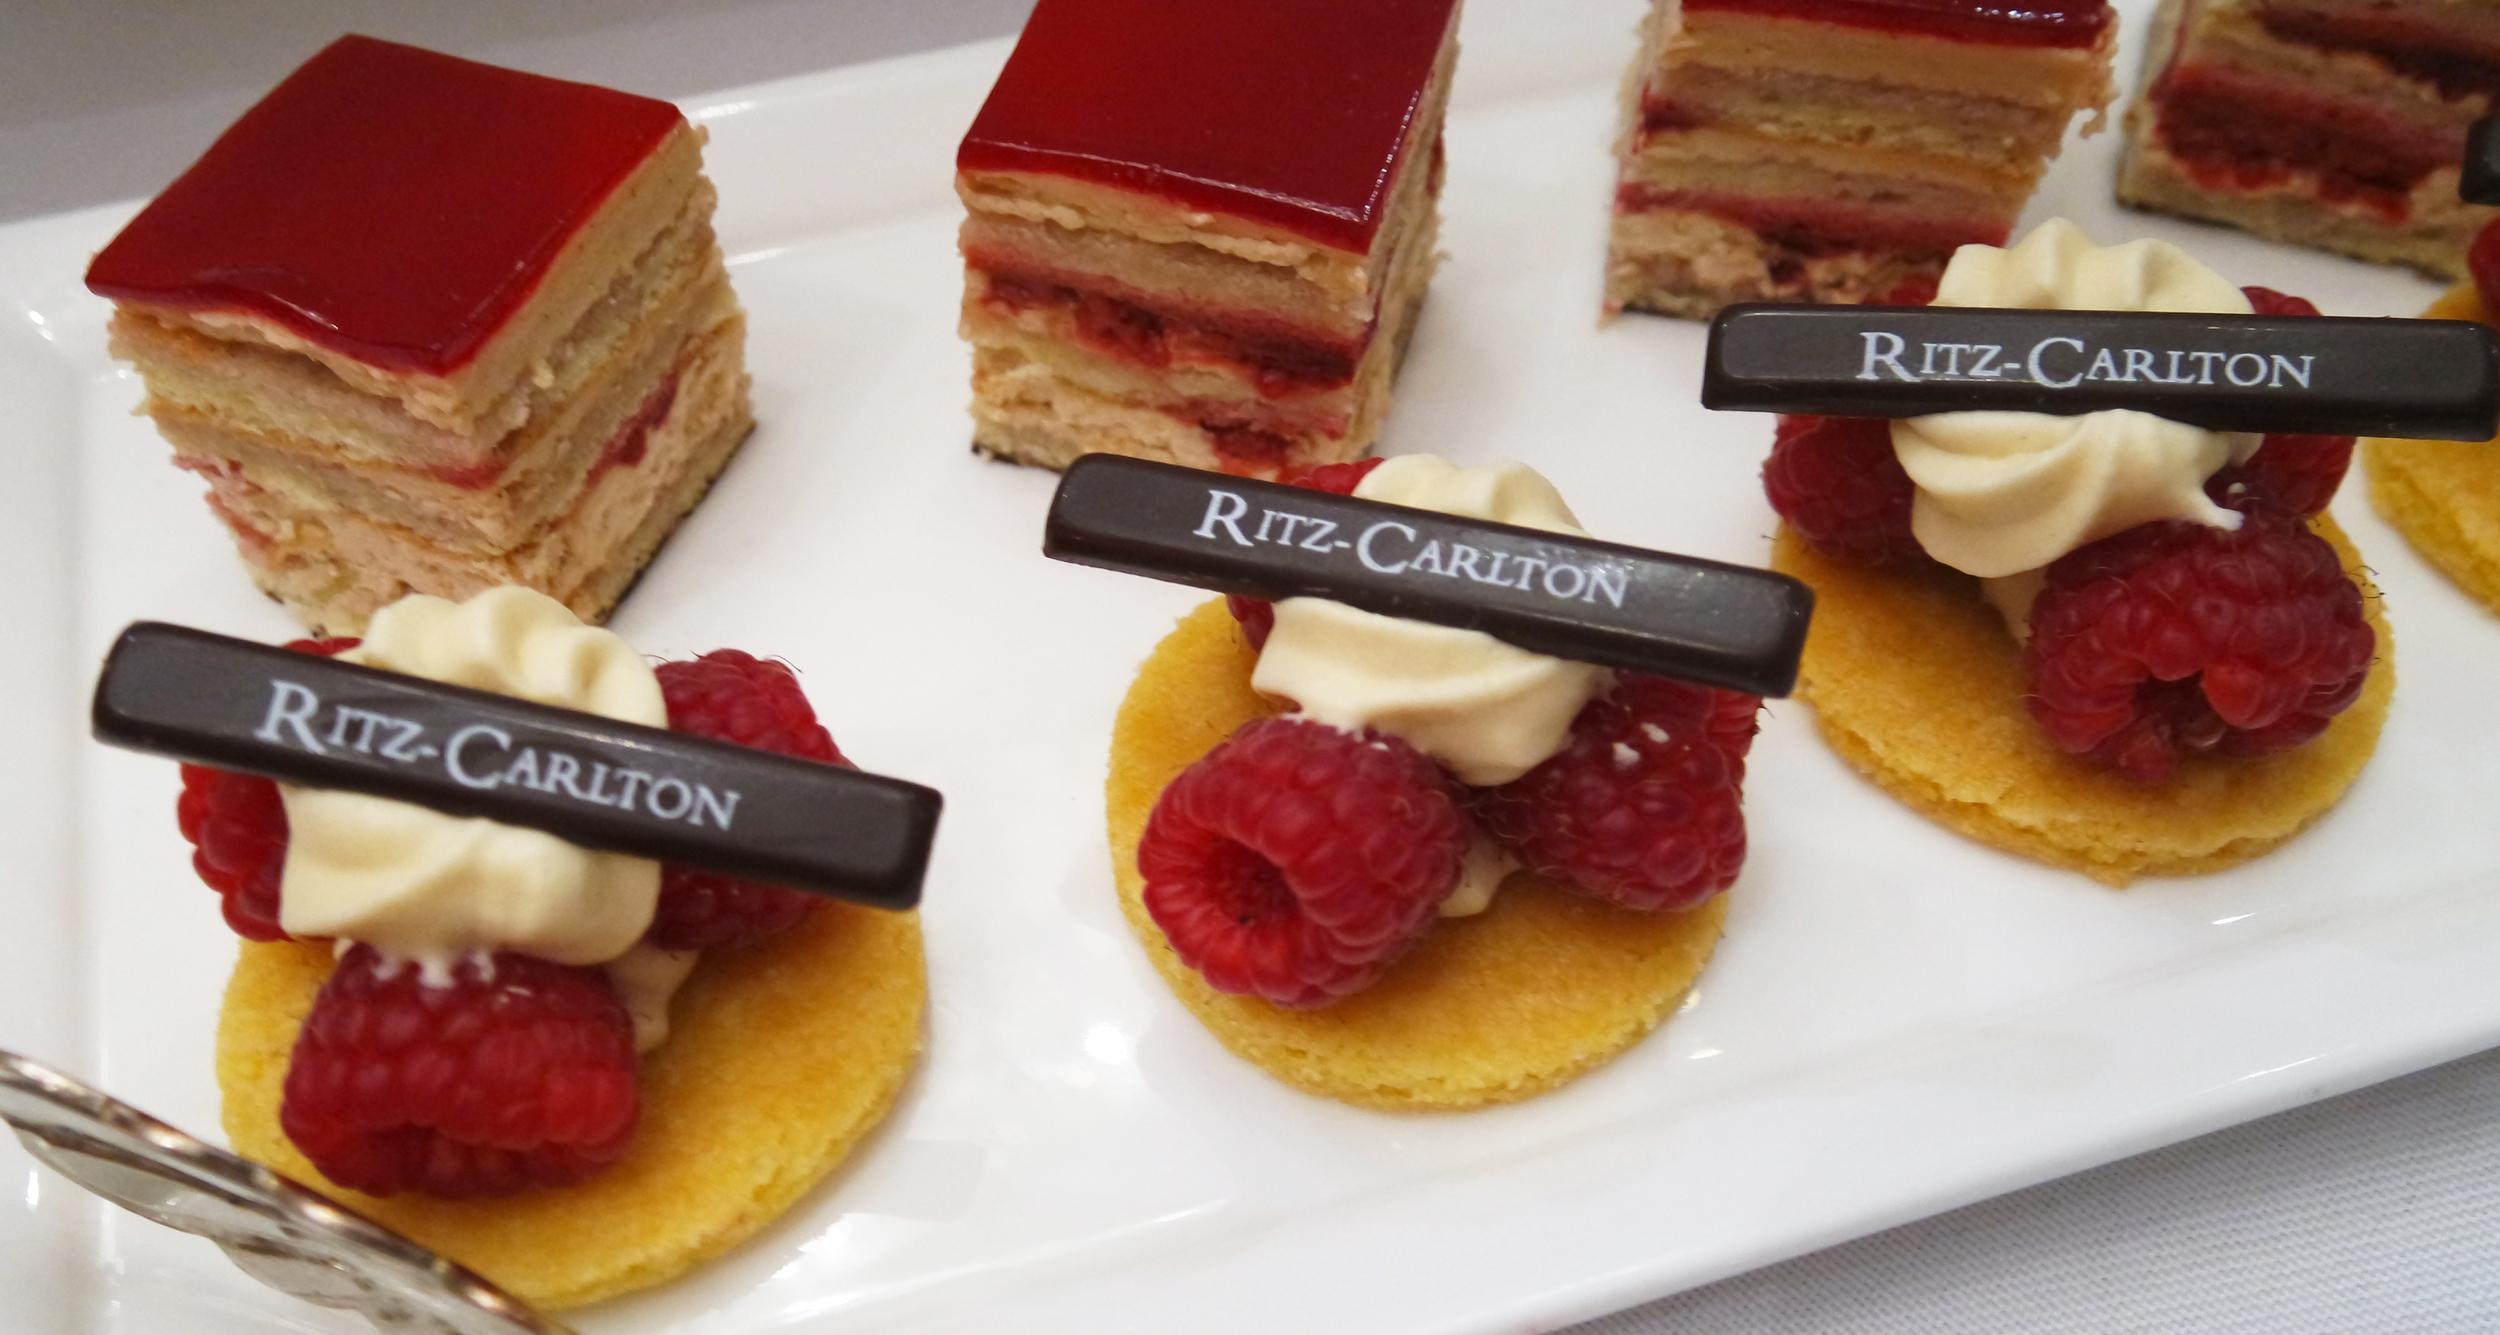 Ritz-Carlton dessert